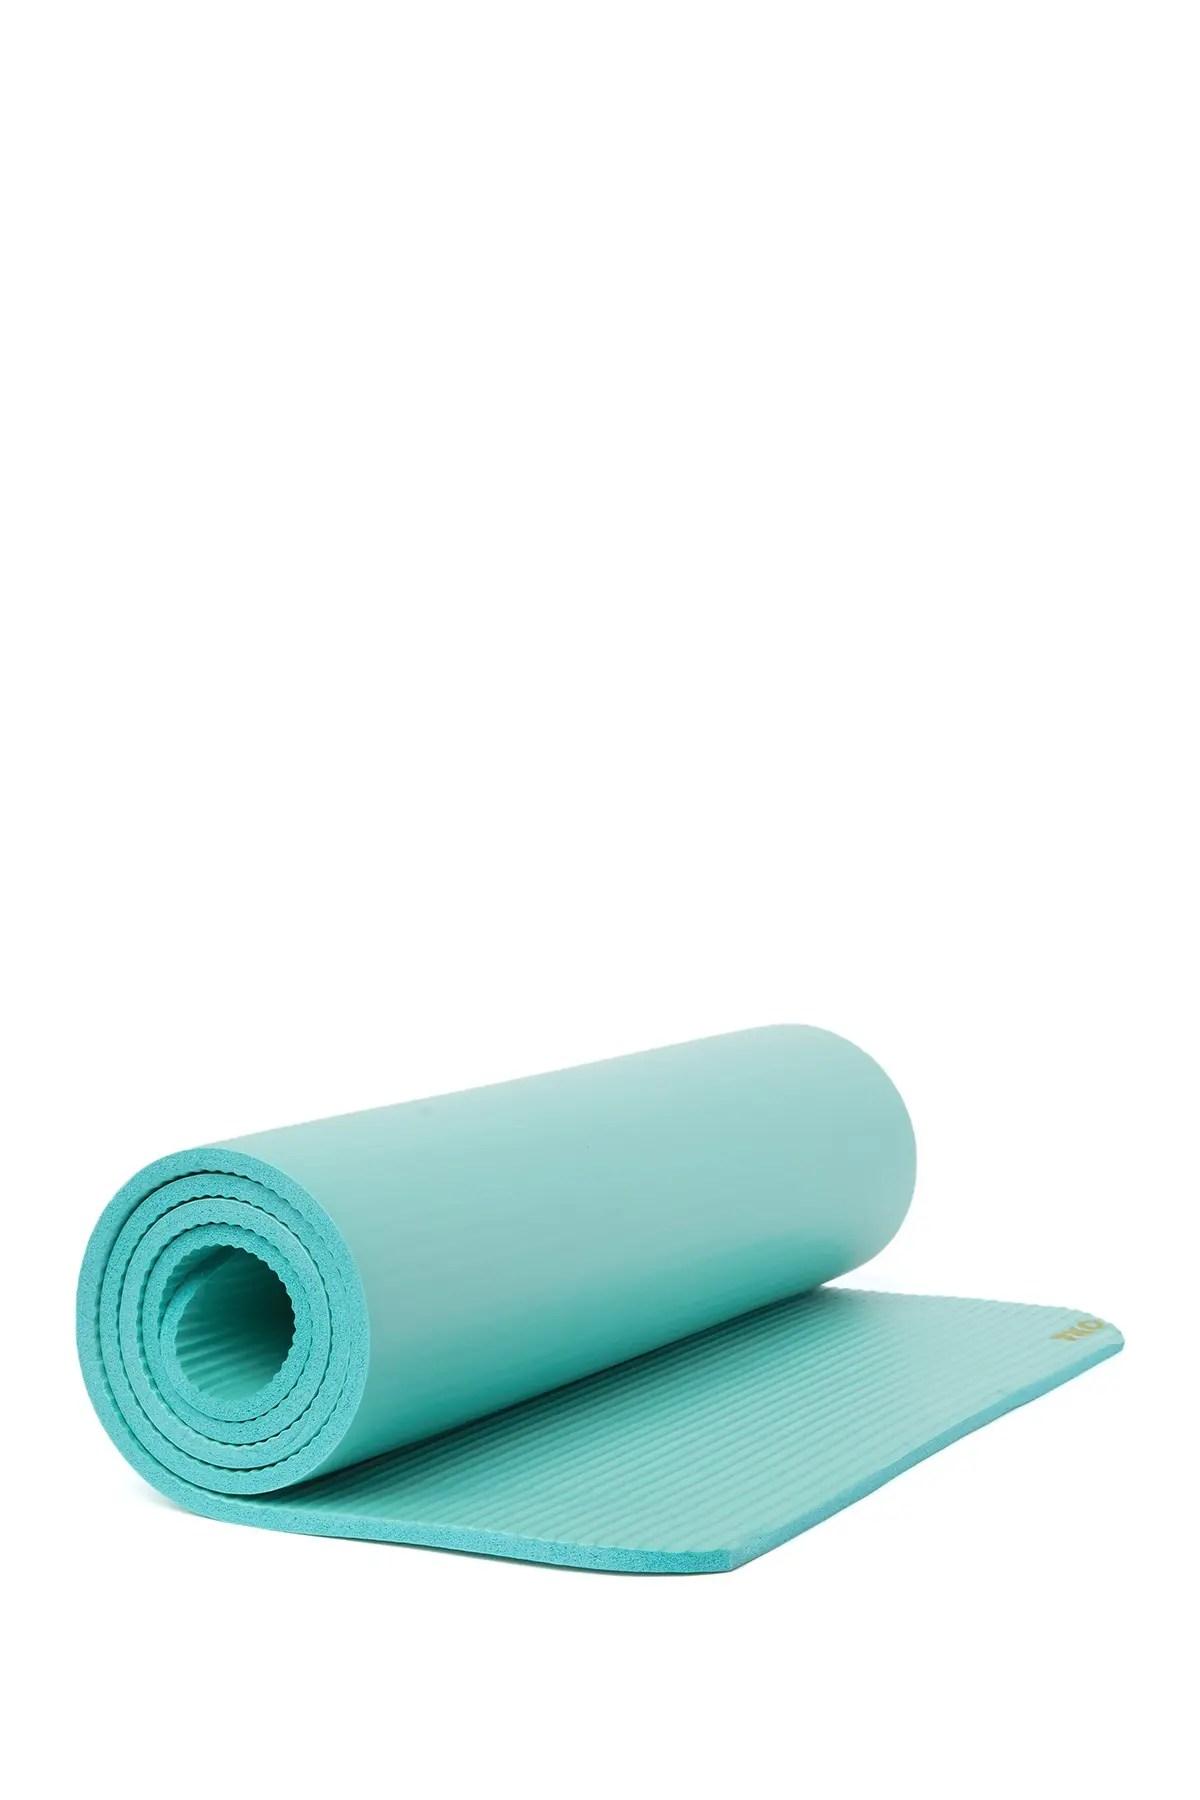 tko 10mm exercise mat w sling green nordstrom rack